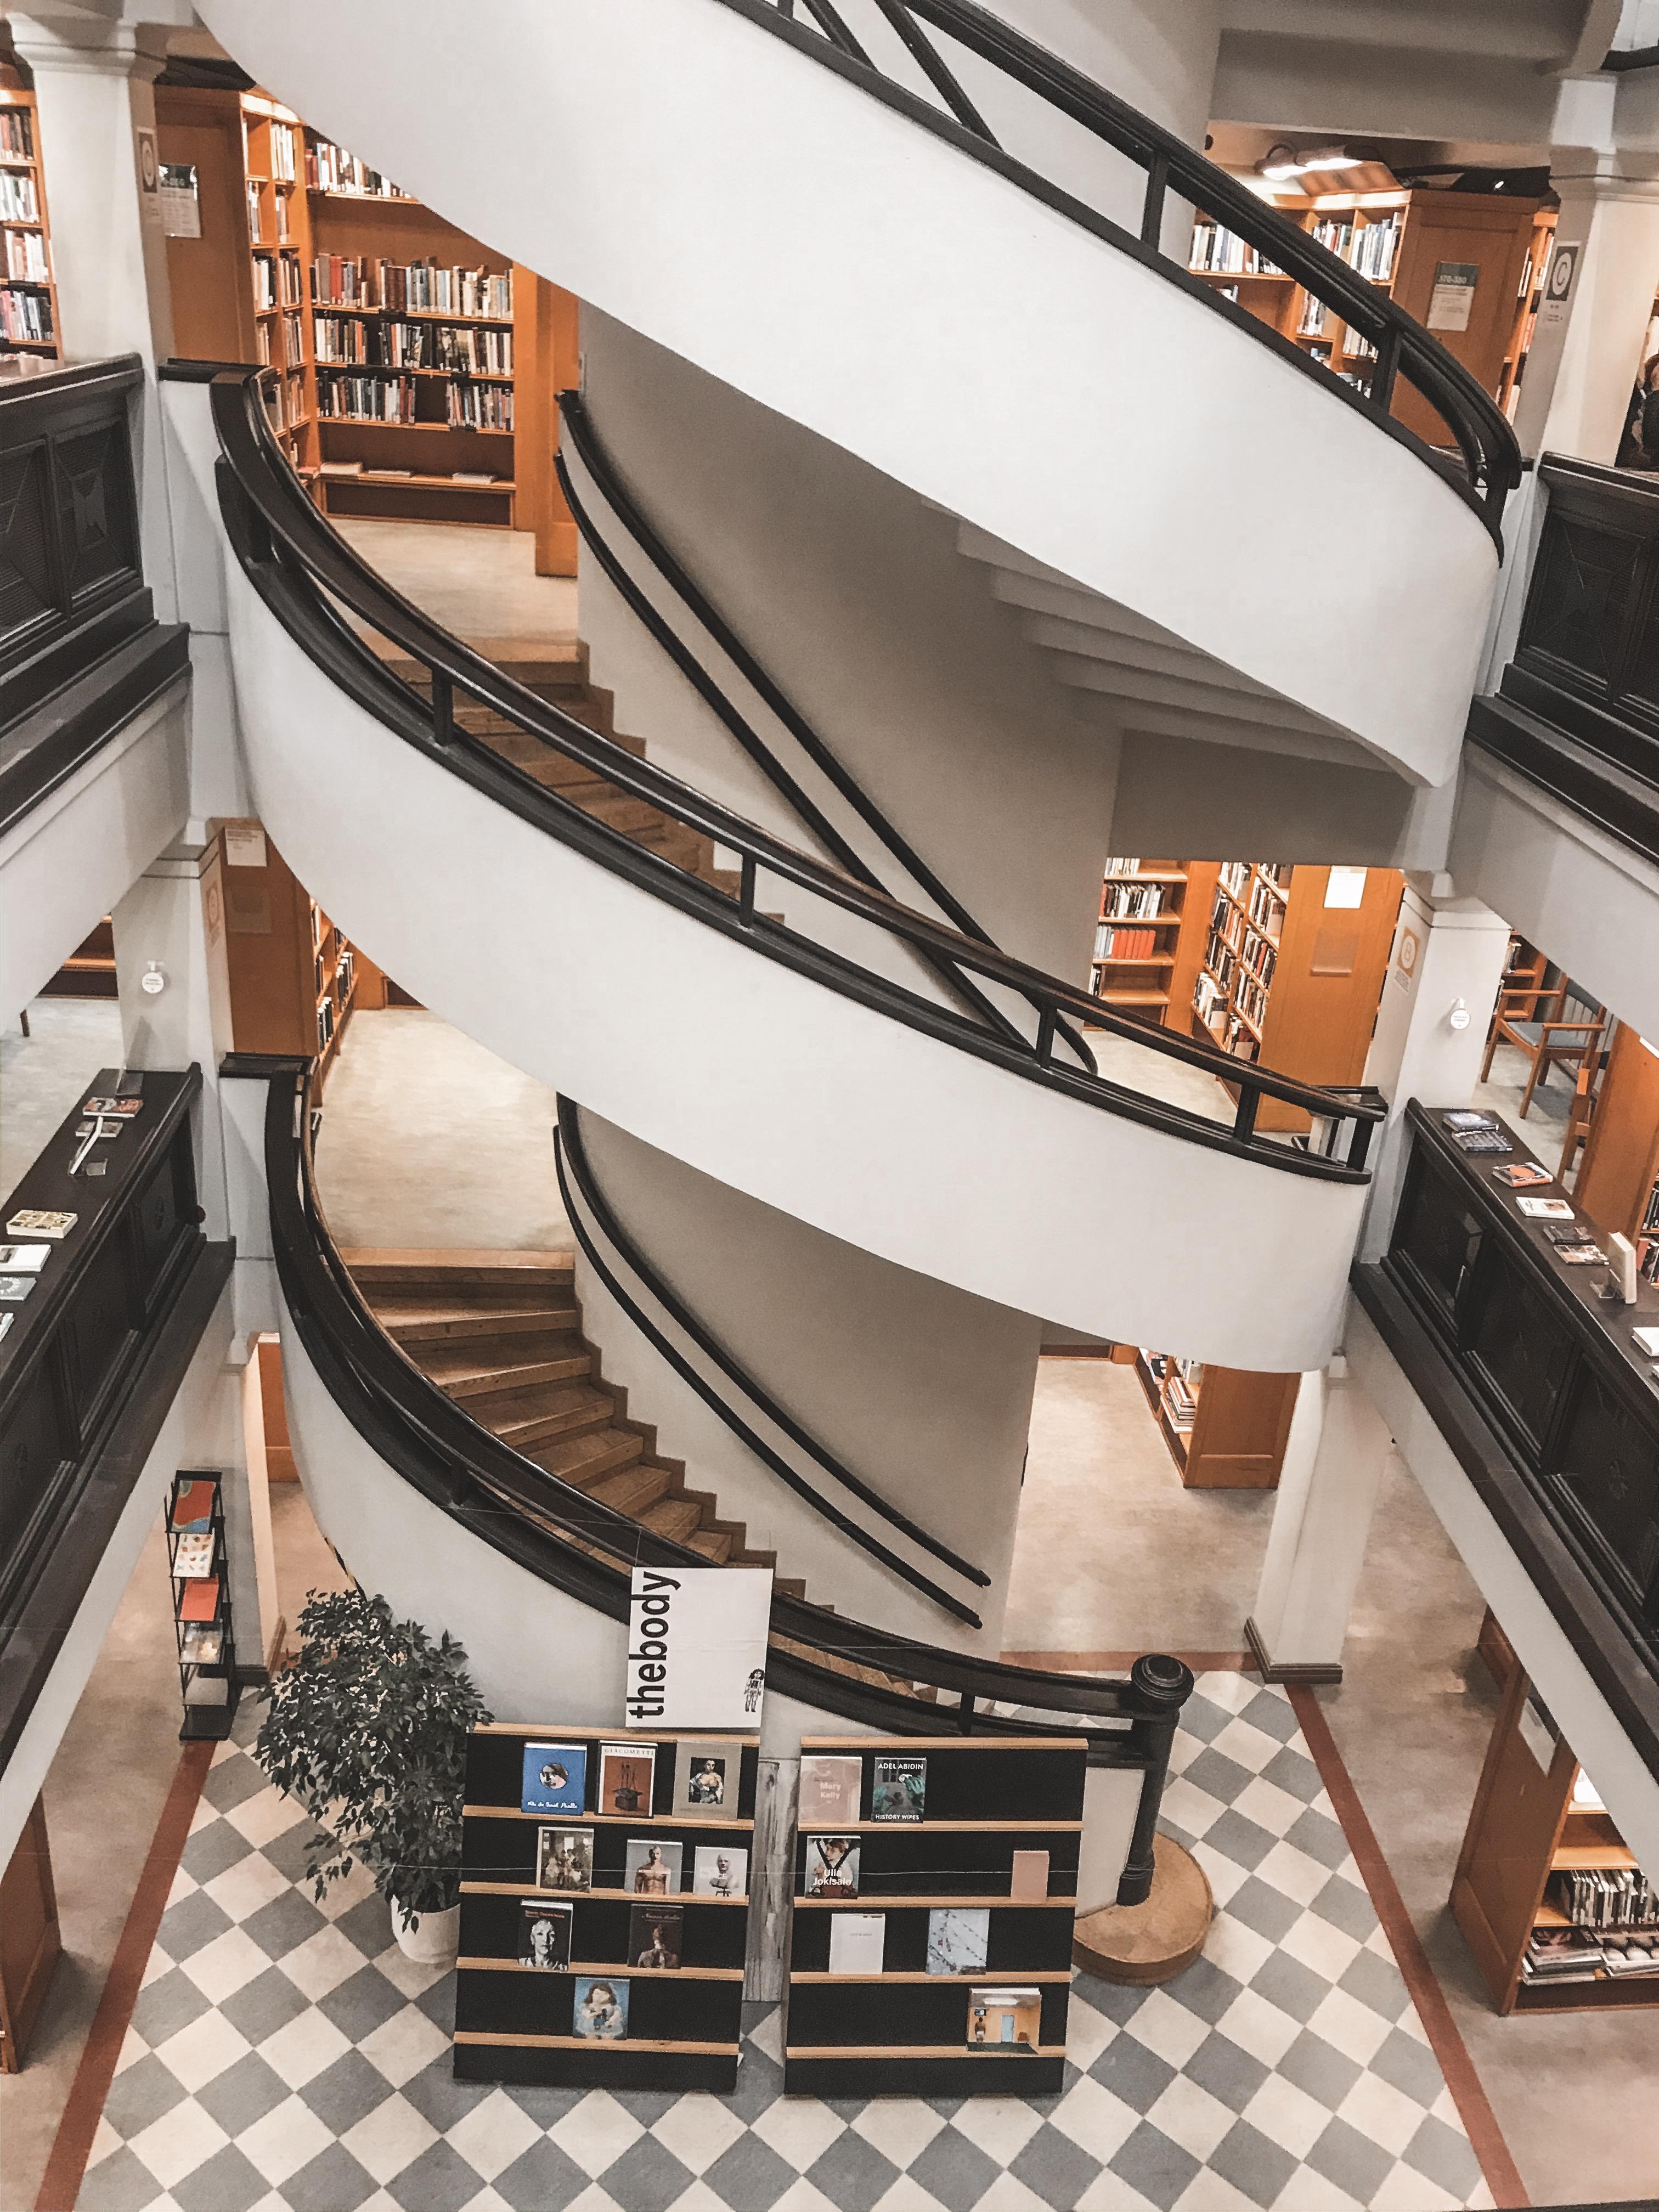 Rikhardinkatu Library in Helsinki, Finland